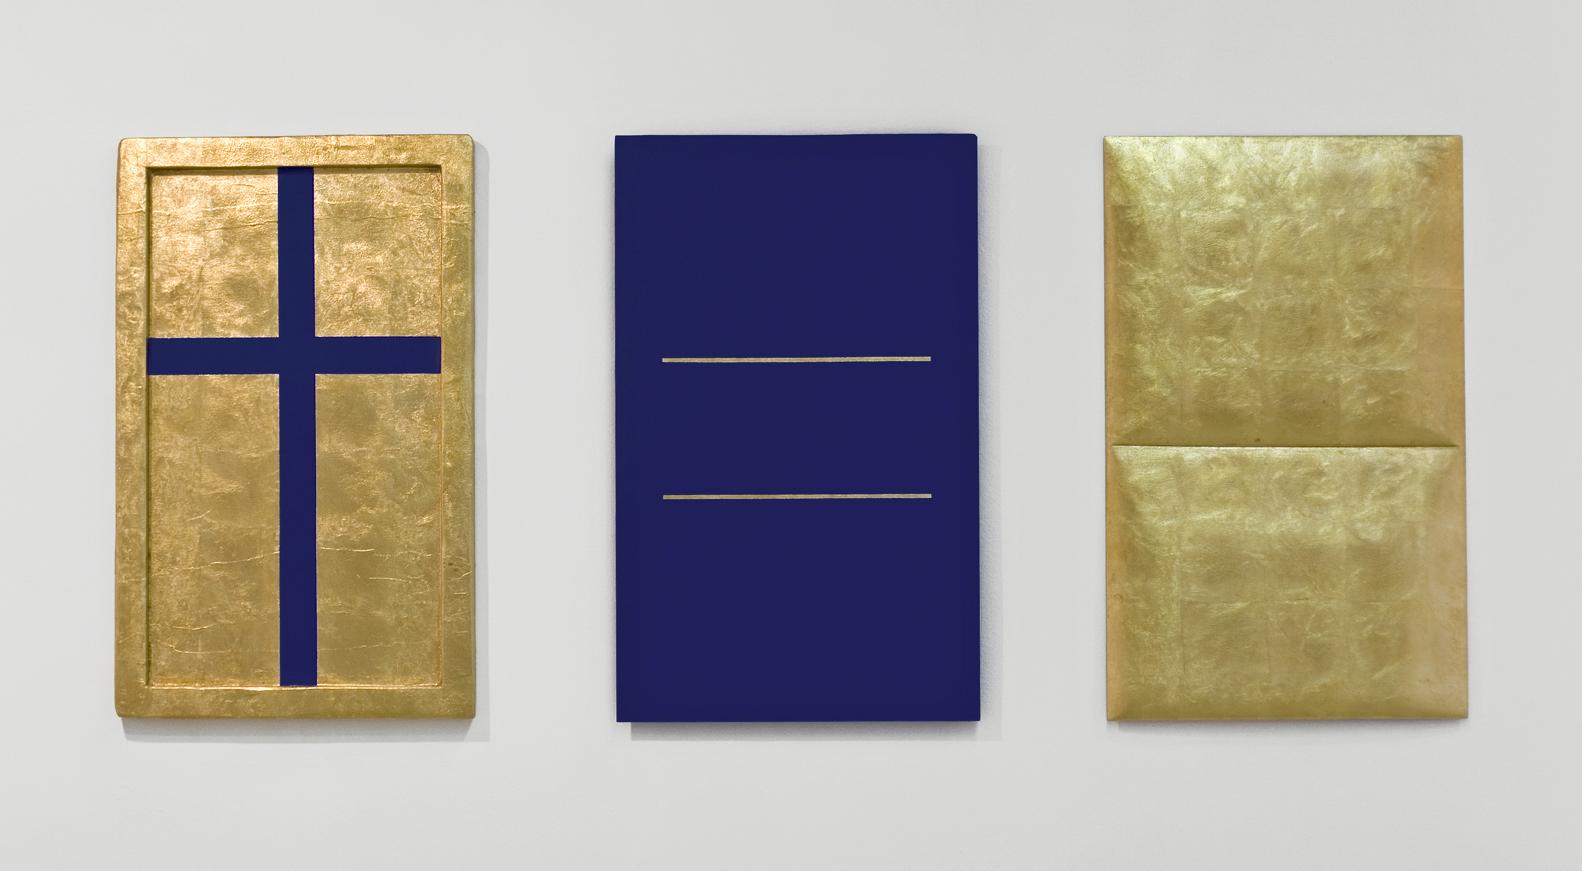 medenina, les, trikrat 110 x 68 cm, 2001